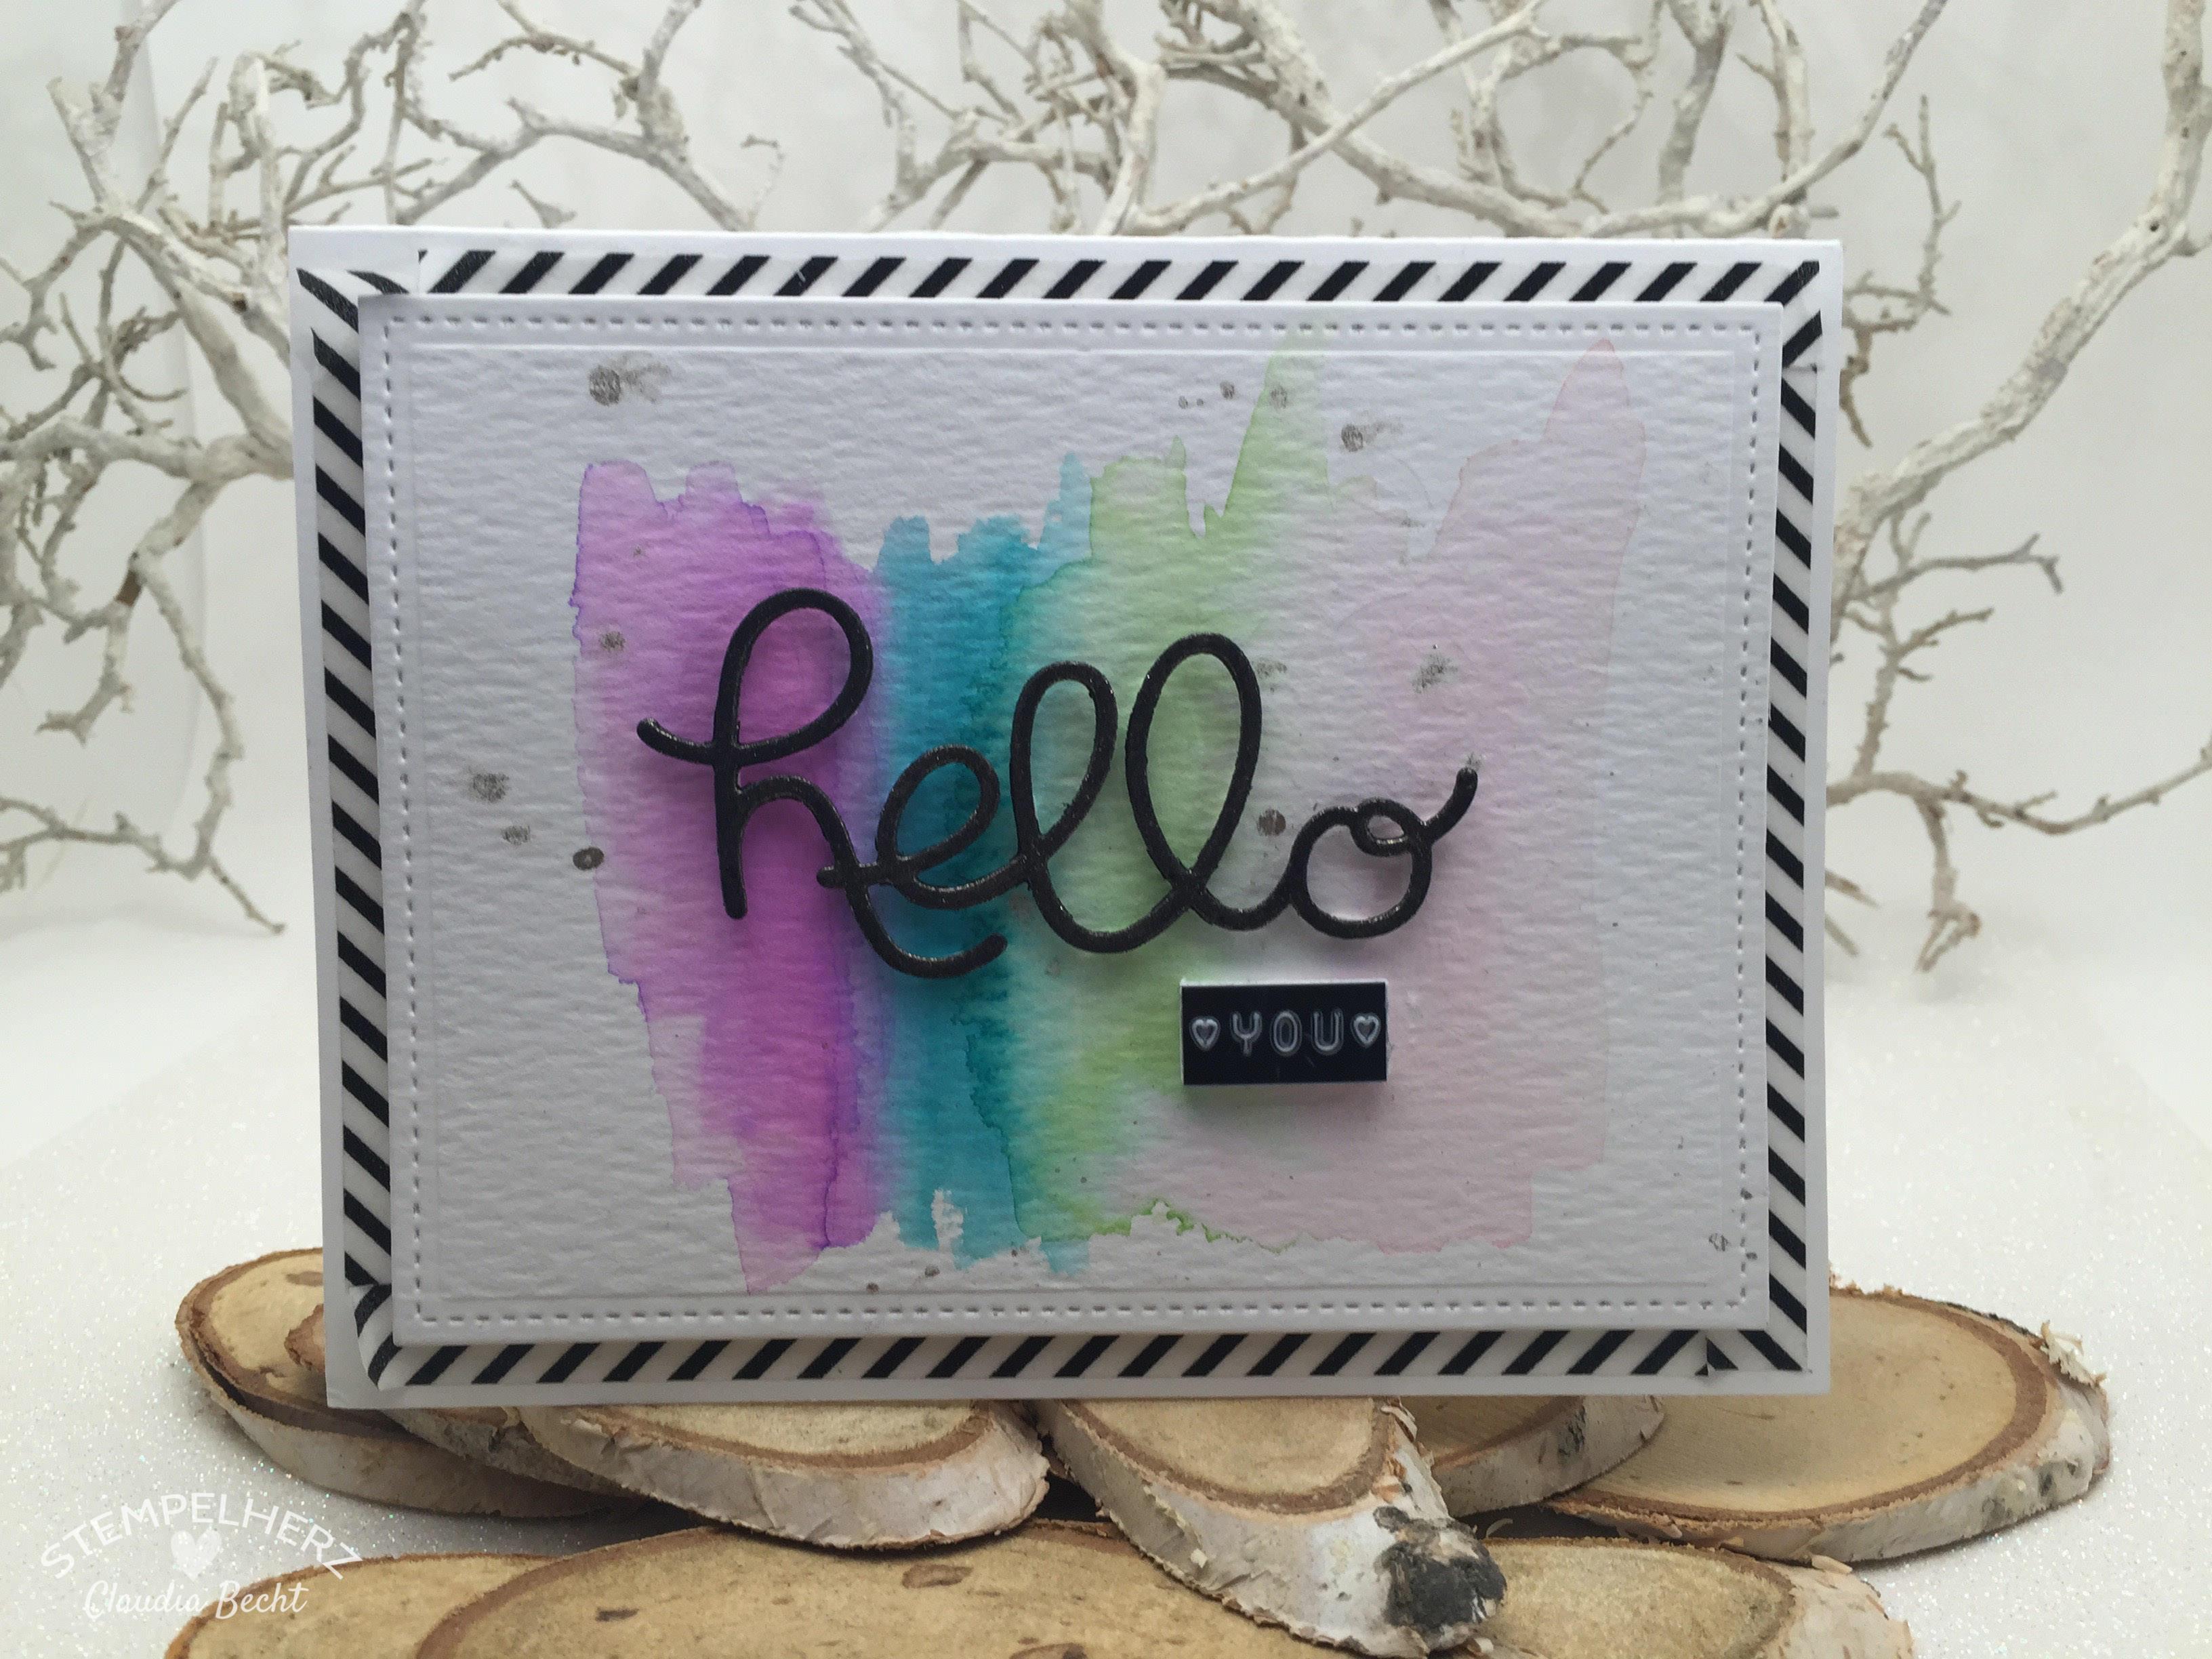 Stampin Up - Stempelherz - Grußkarte - Hello You - Aquarell - Watercolor - Grußkarte Hello You 01